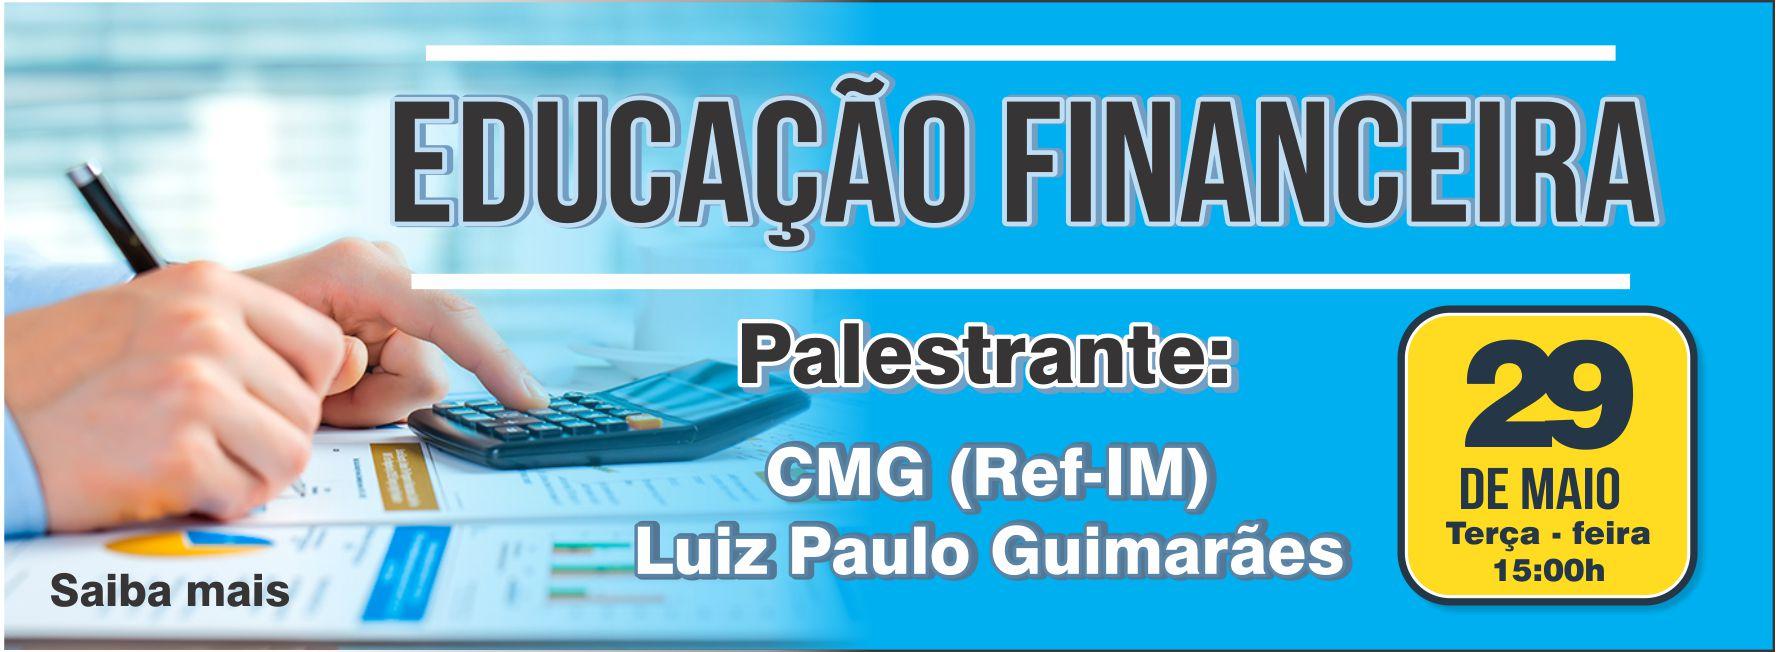 https://www.clubenaval.org.br/novo/palestra-educa%C3%A7%C3%A3o-financeira